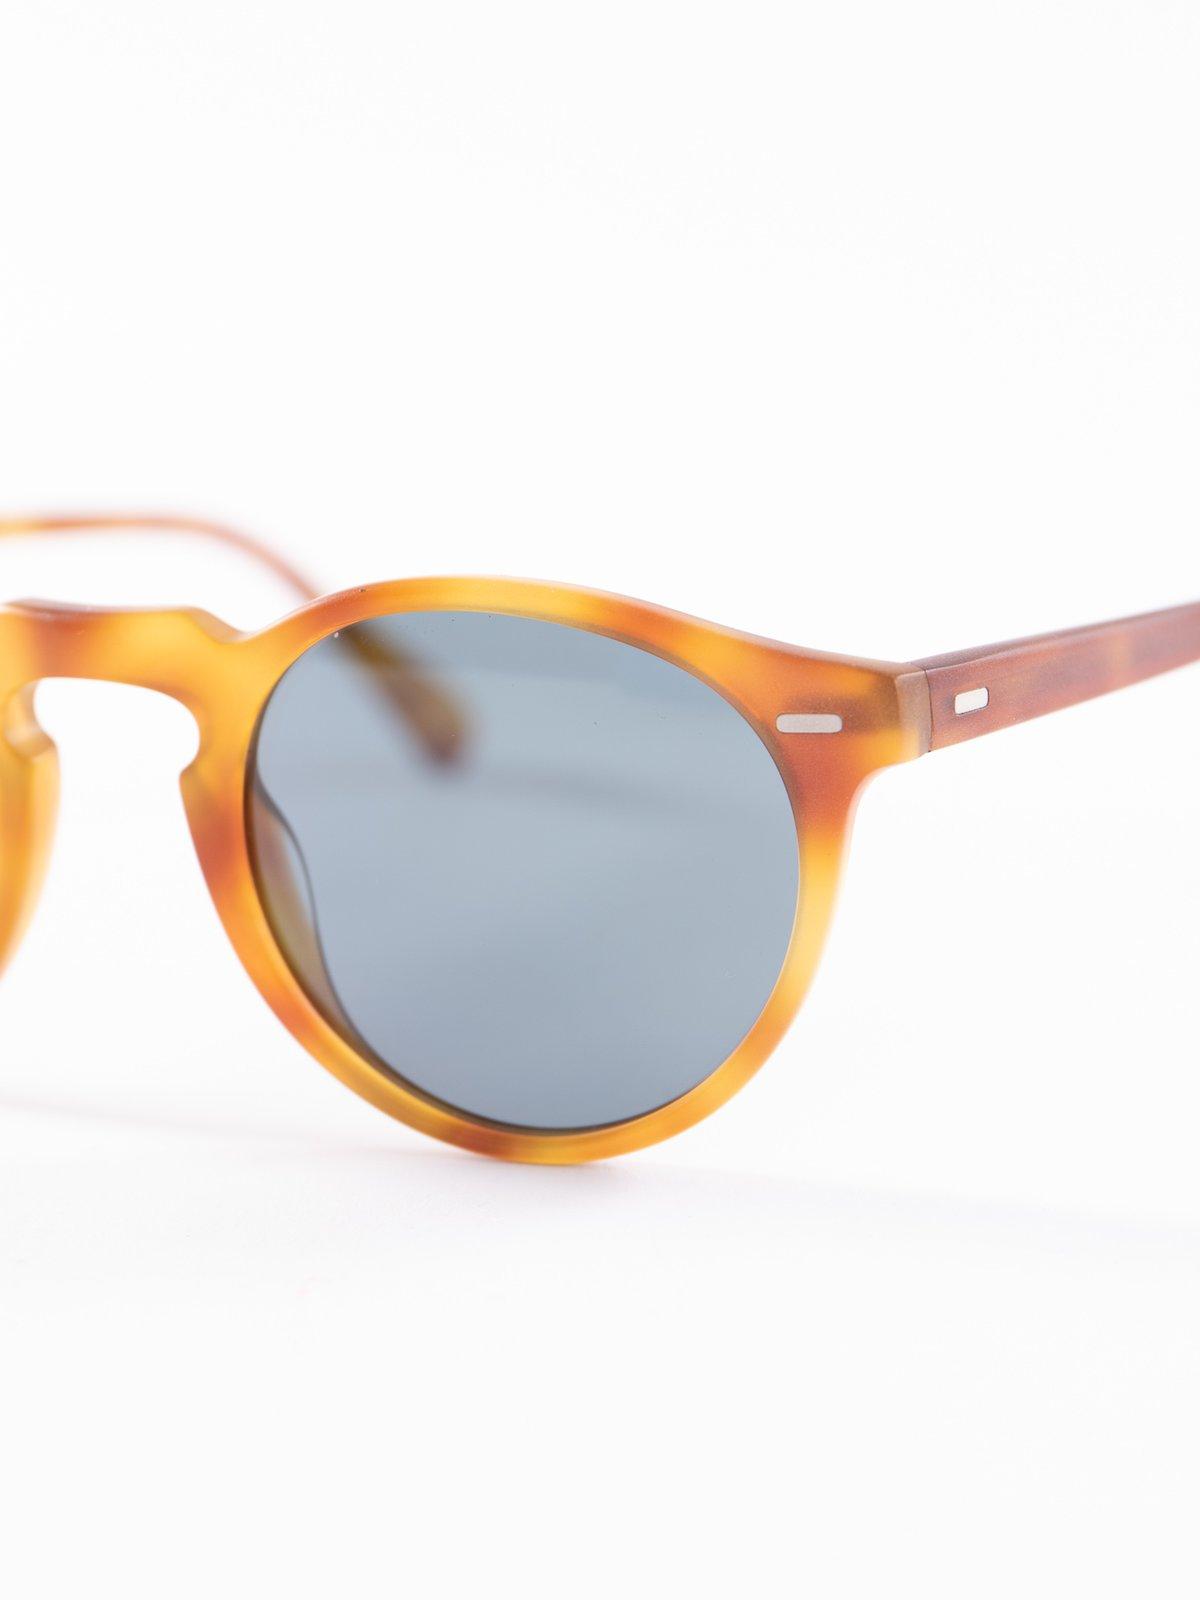 Semi–Matte LBR/Blue Photochromic Gregory Peck Sunglasses - Image 3